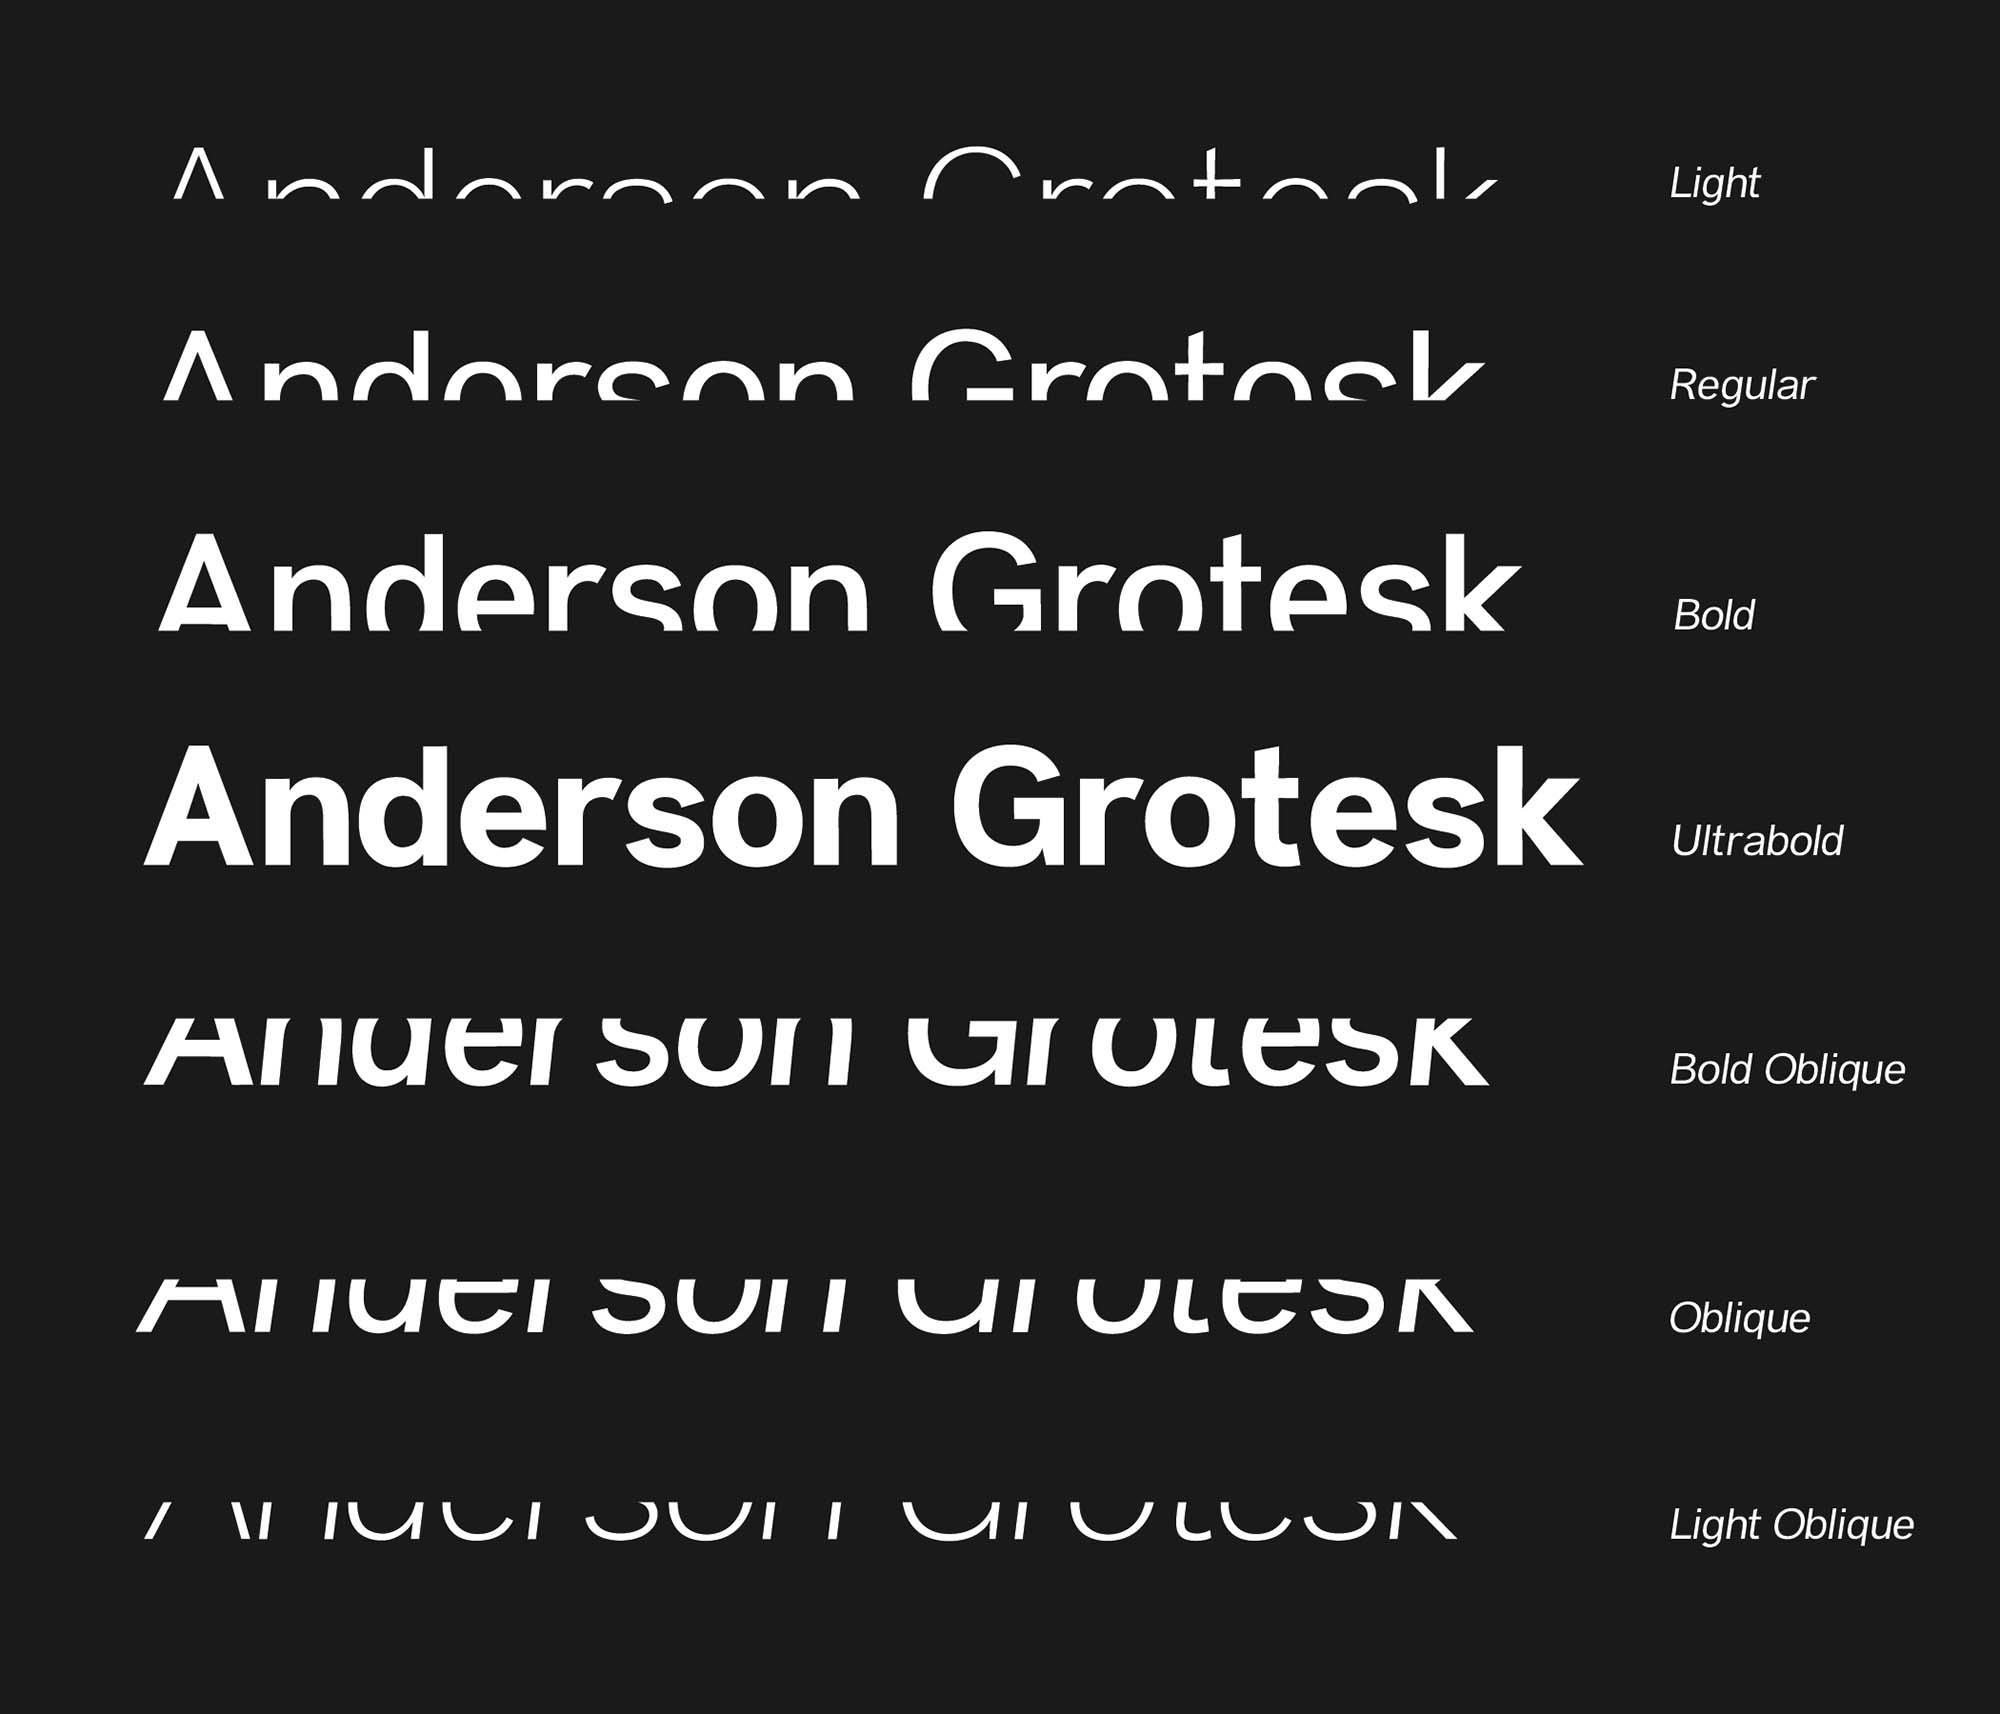 Anderson Grotesk Font